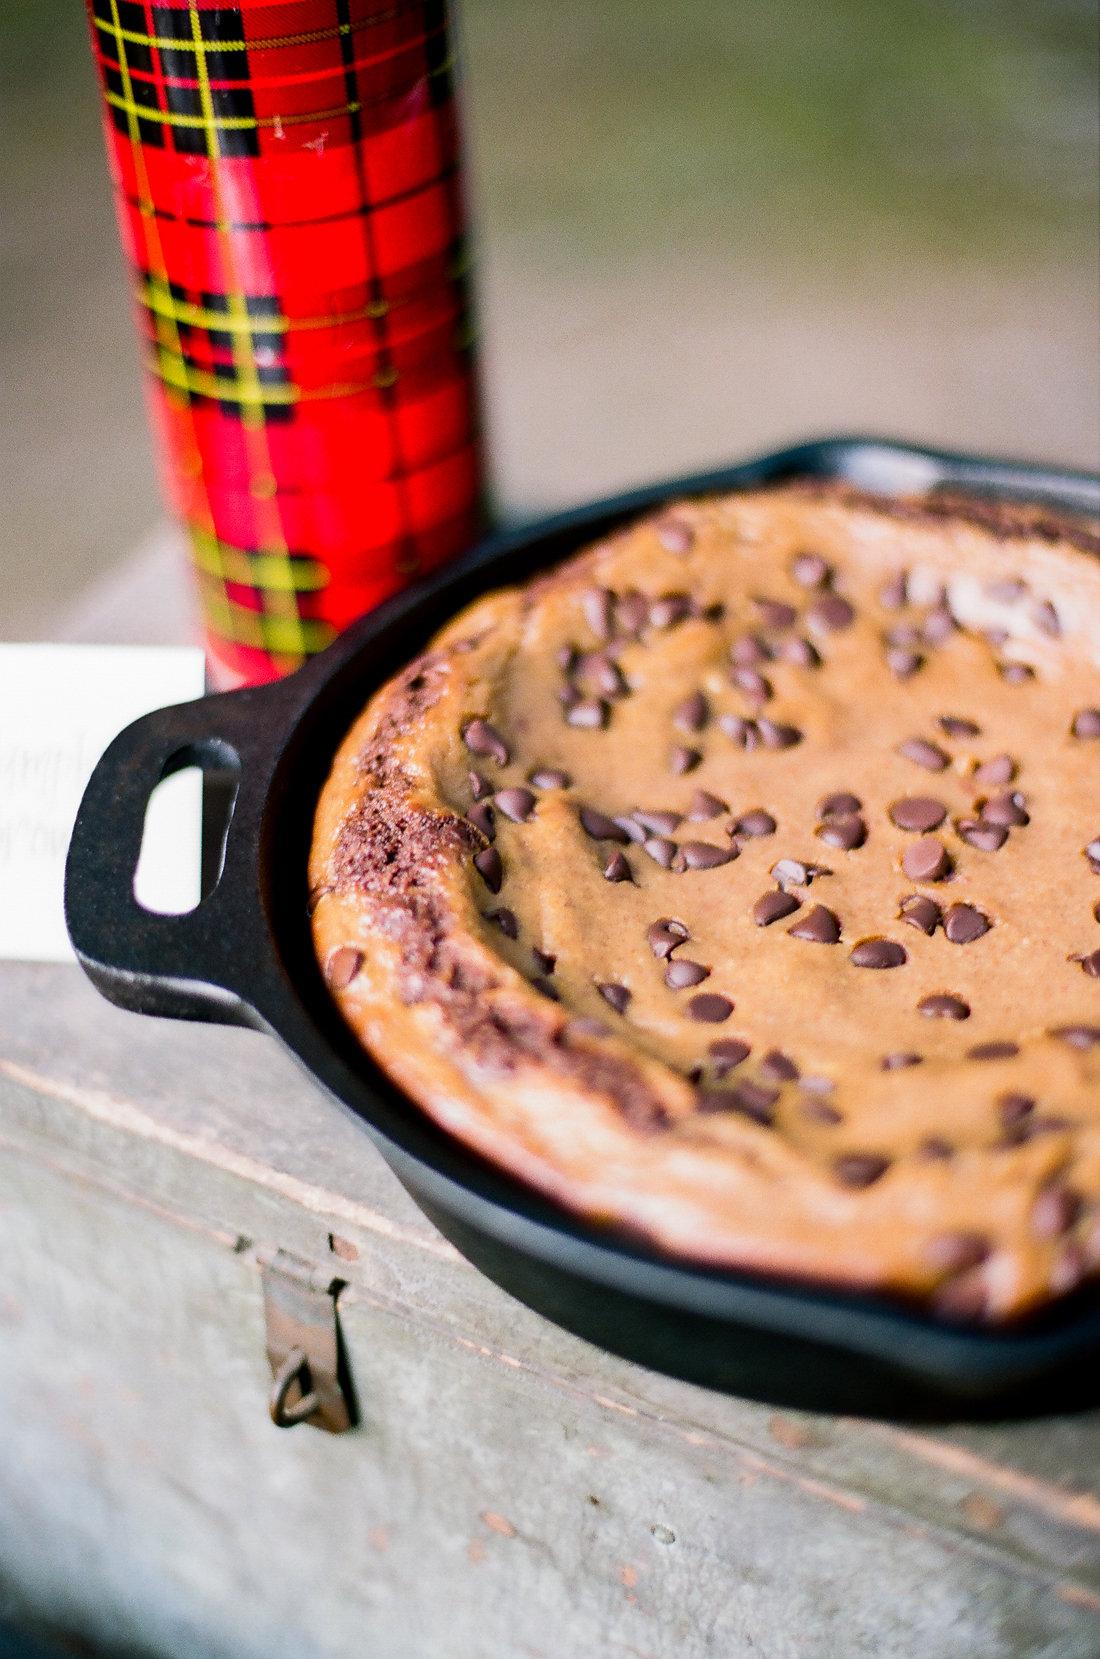 prop + food styling: jennifer oatsvall of {feather + oak}, photography:  jenna henderson